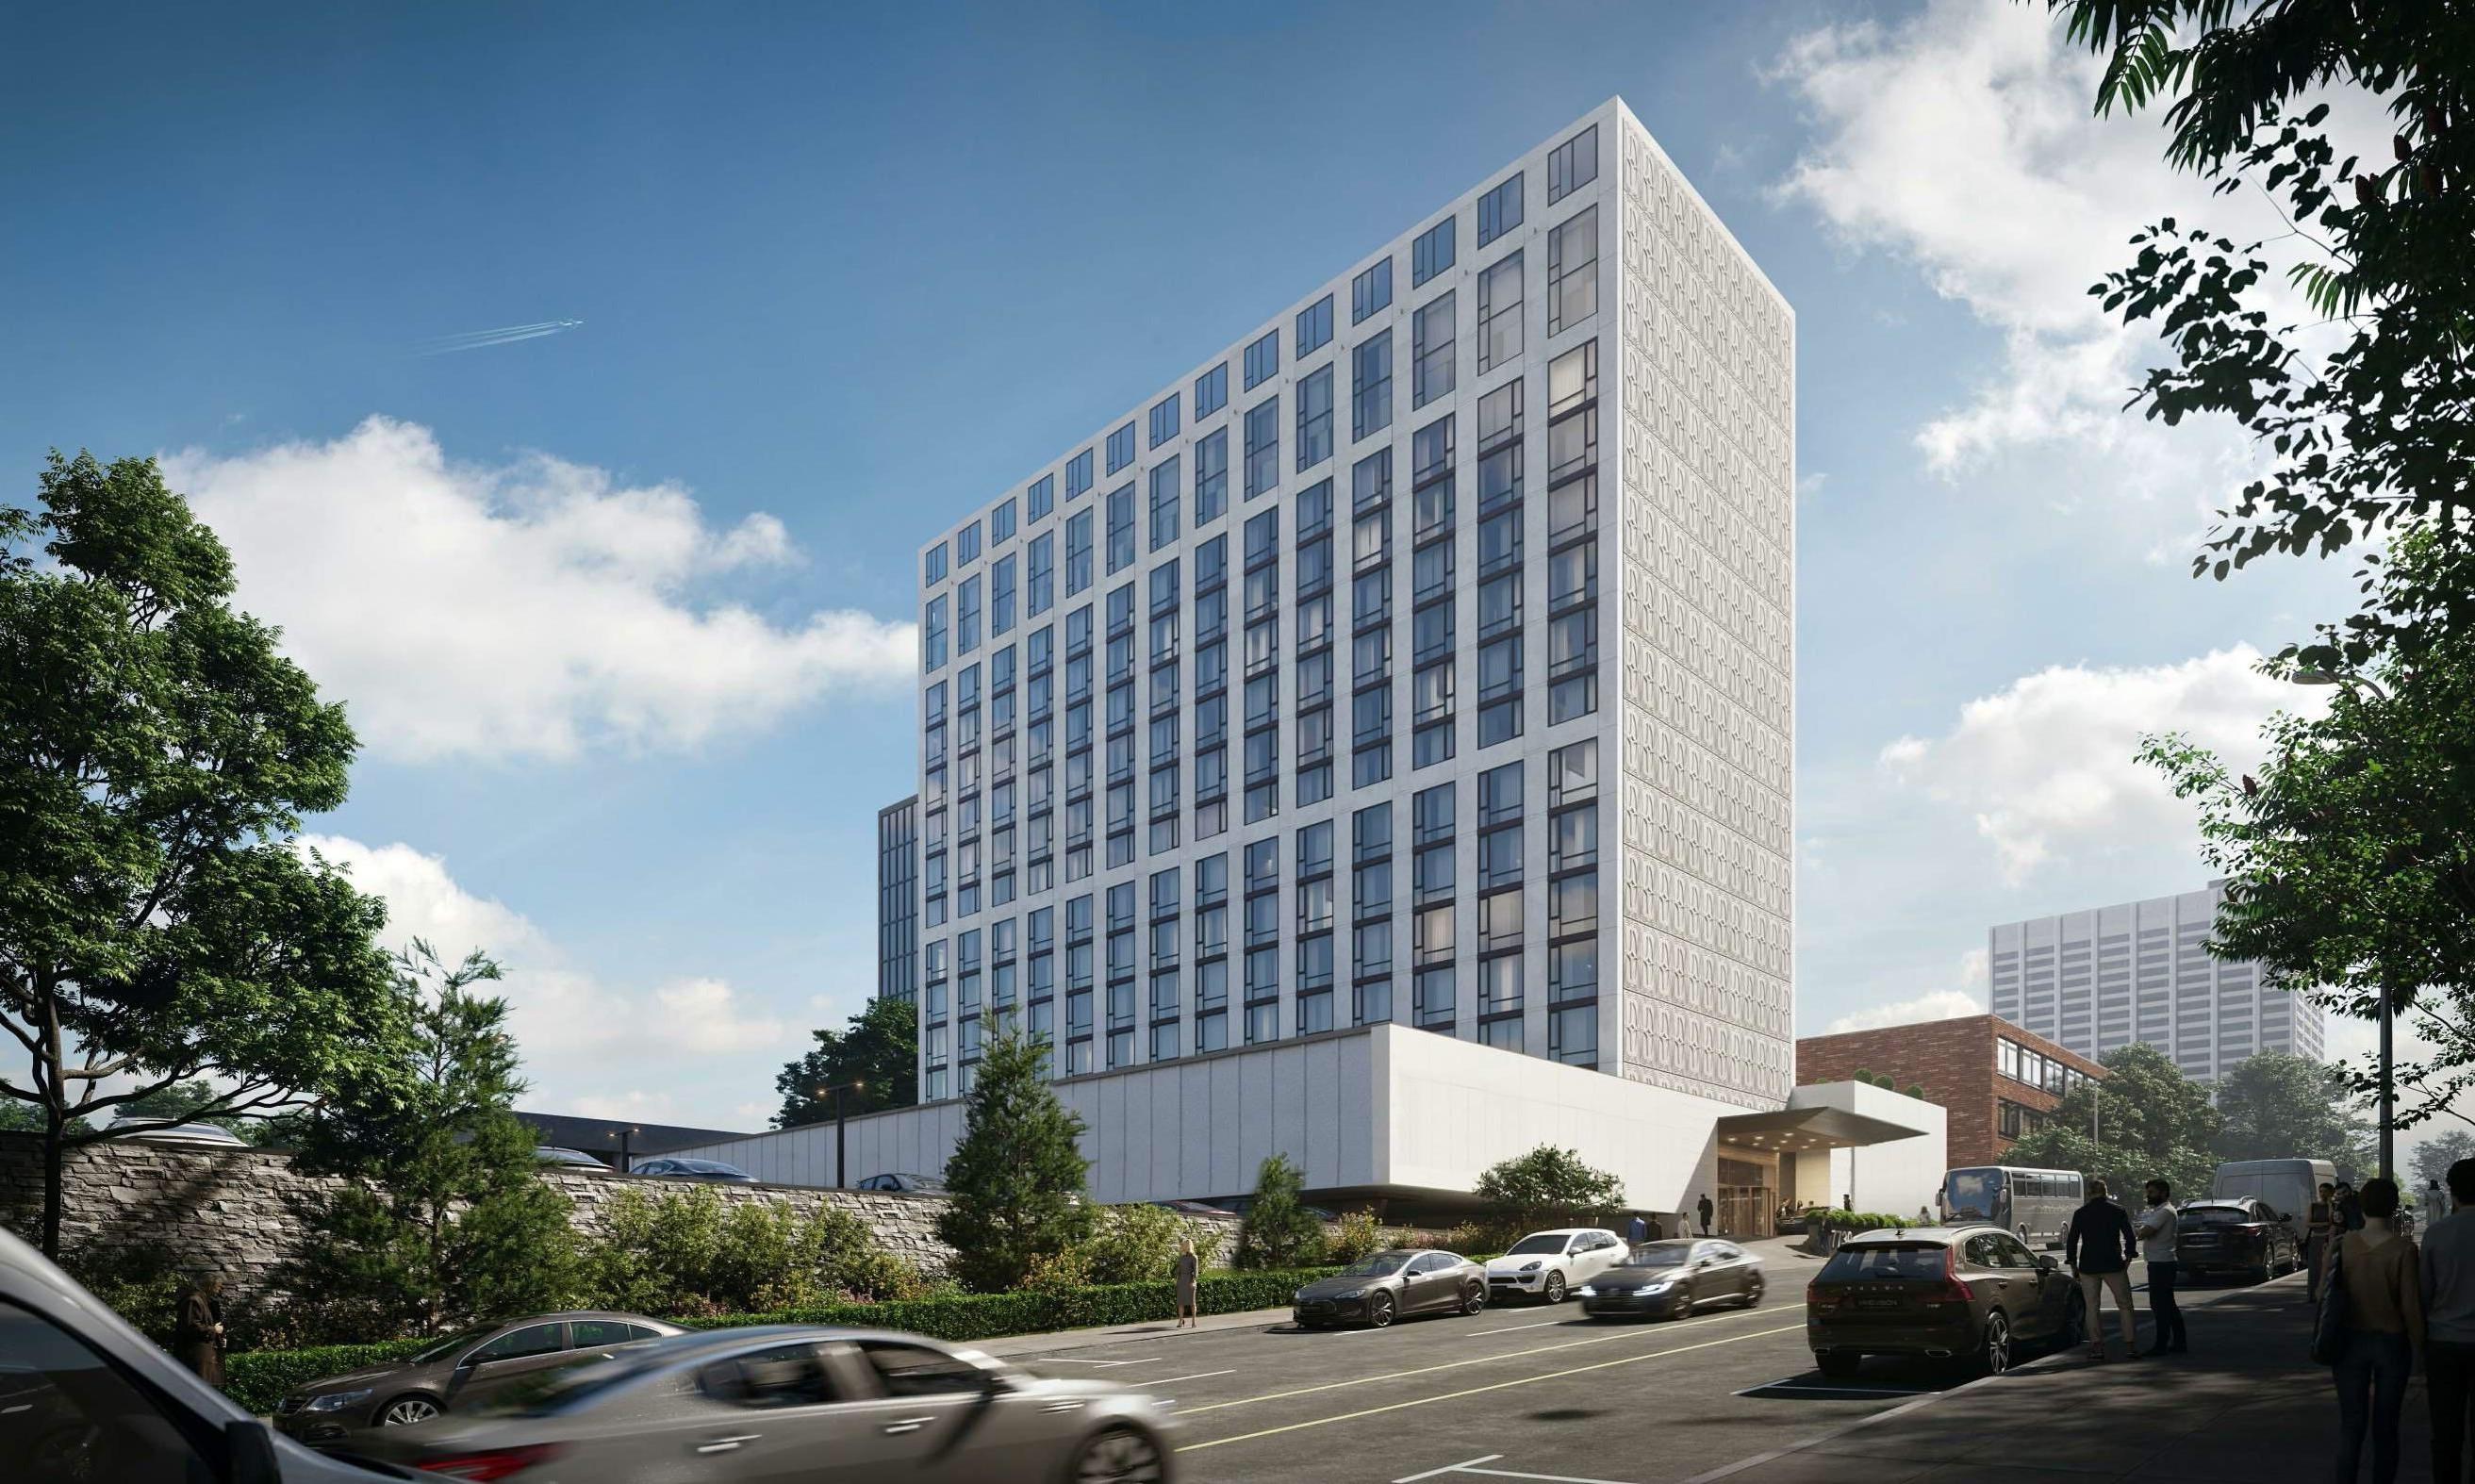 New Owner Plans $20 million Renovation for Sheraton Clayton Plaza Hotel